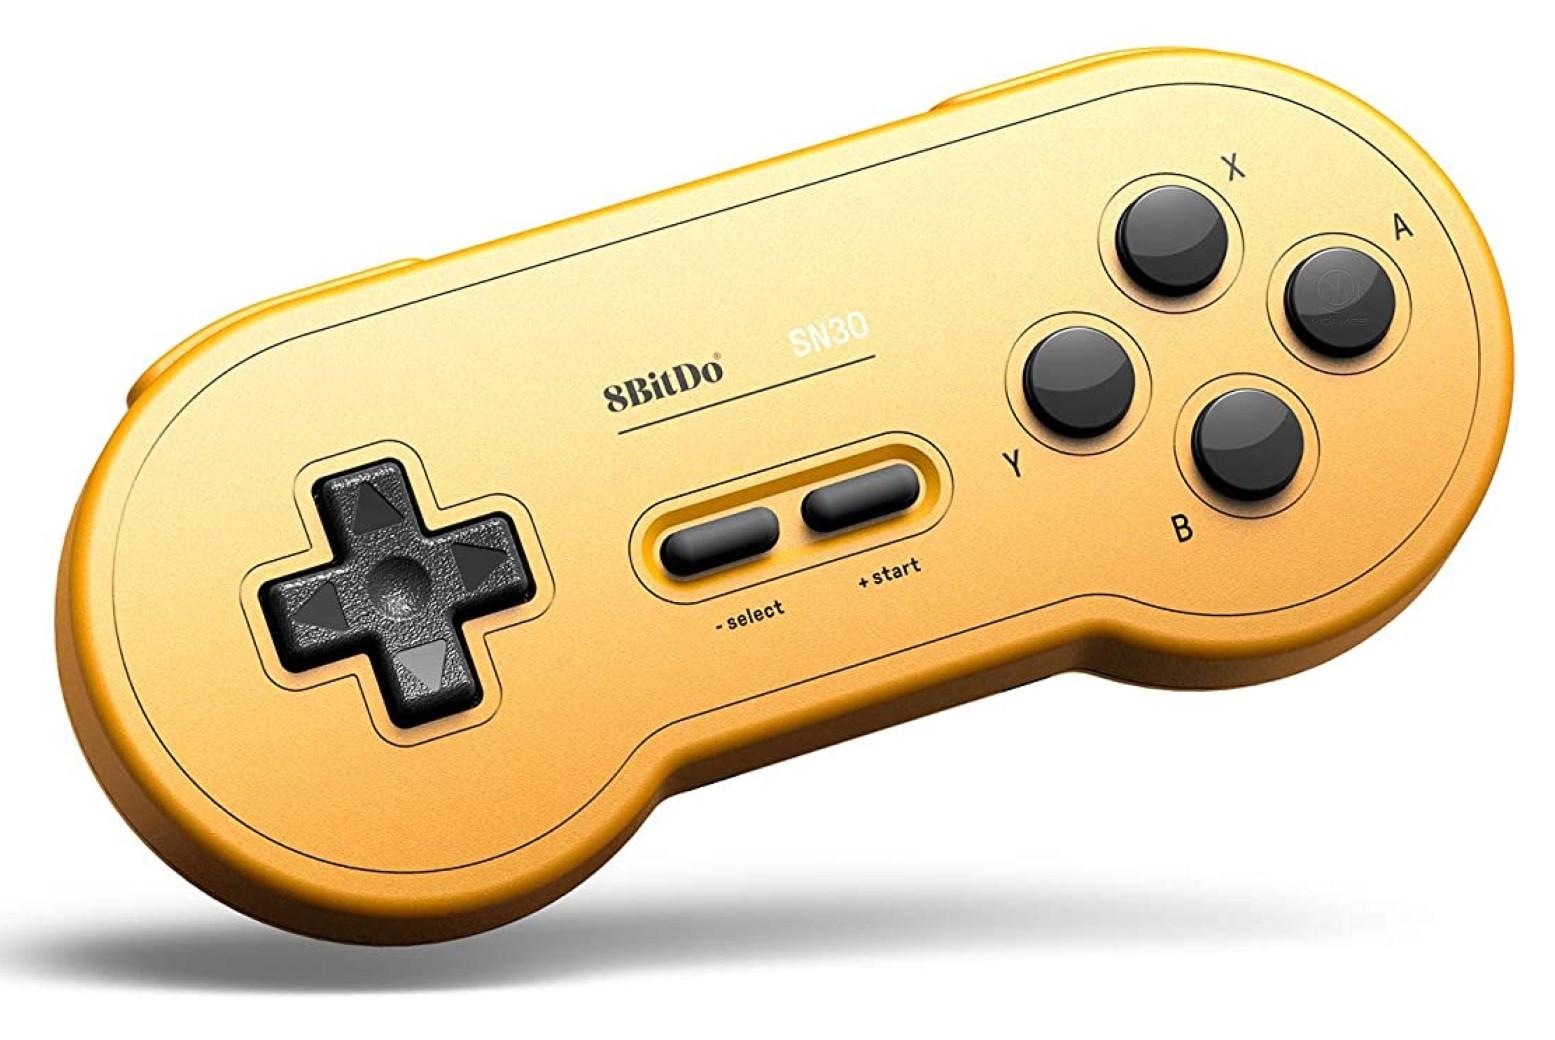 8BitDo SN30 Wireless Bluetooth Gamepad GP Yellow | 8BitDo SN30 бездротовий Bluetooth контролер/джойстик/геймпад